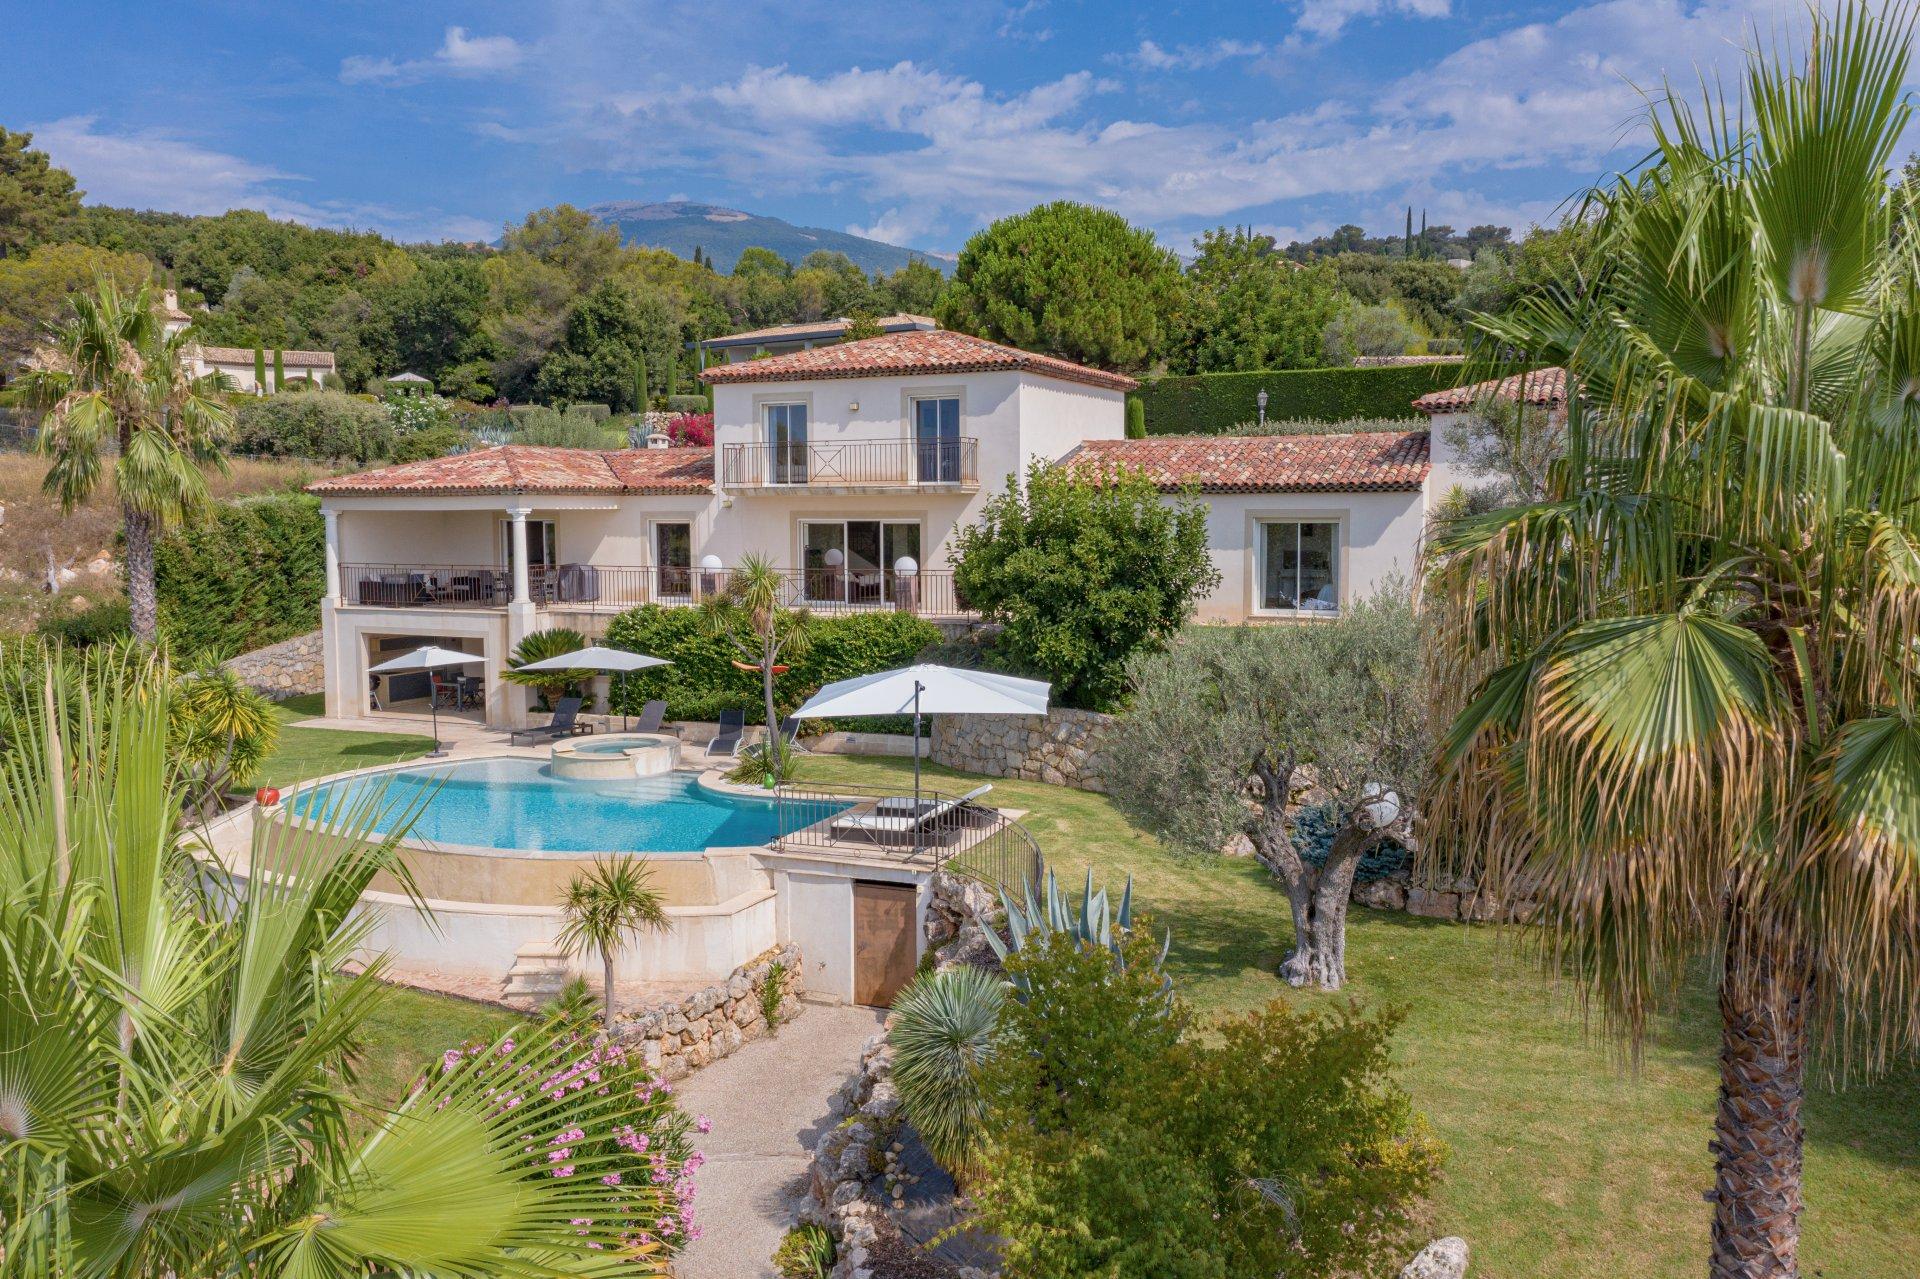 Very peaceful recent villa